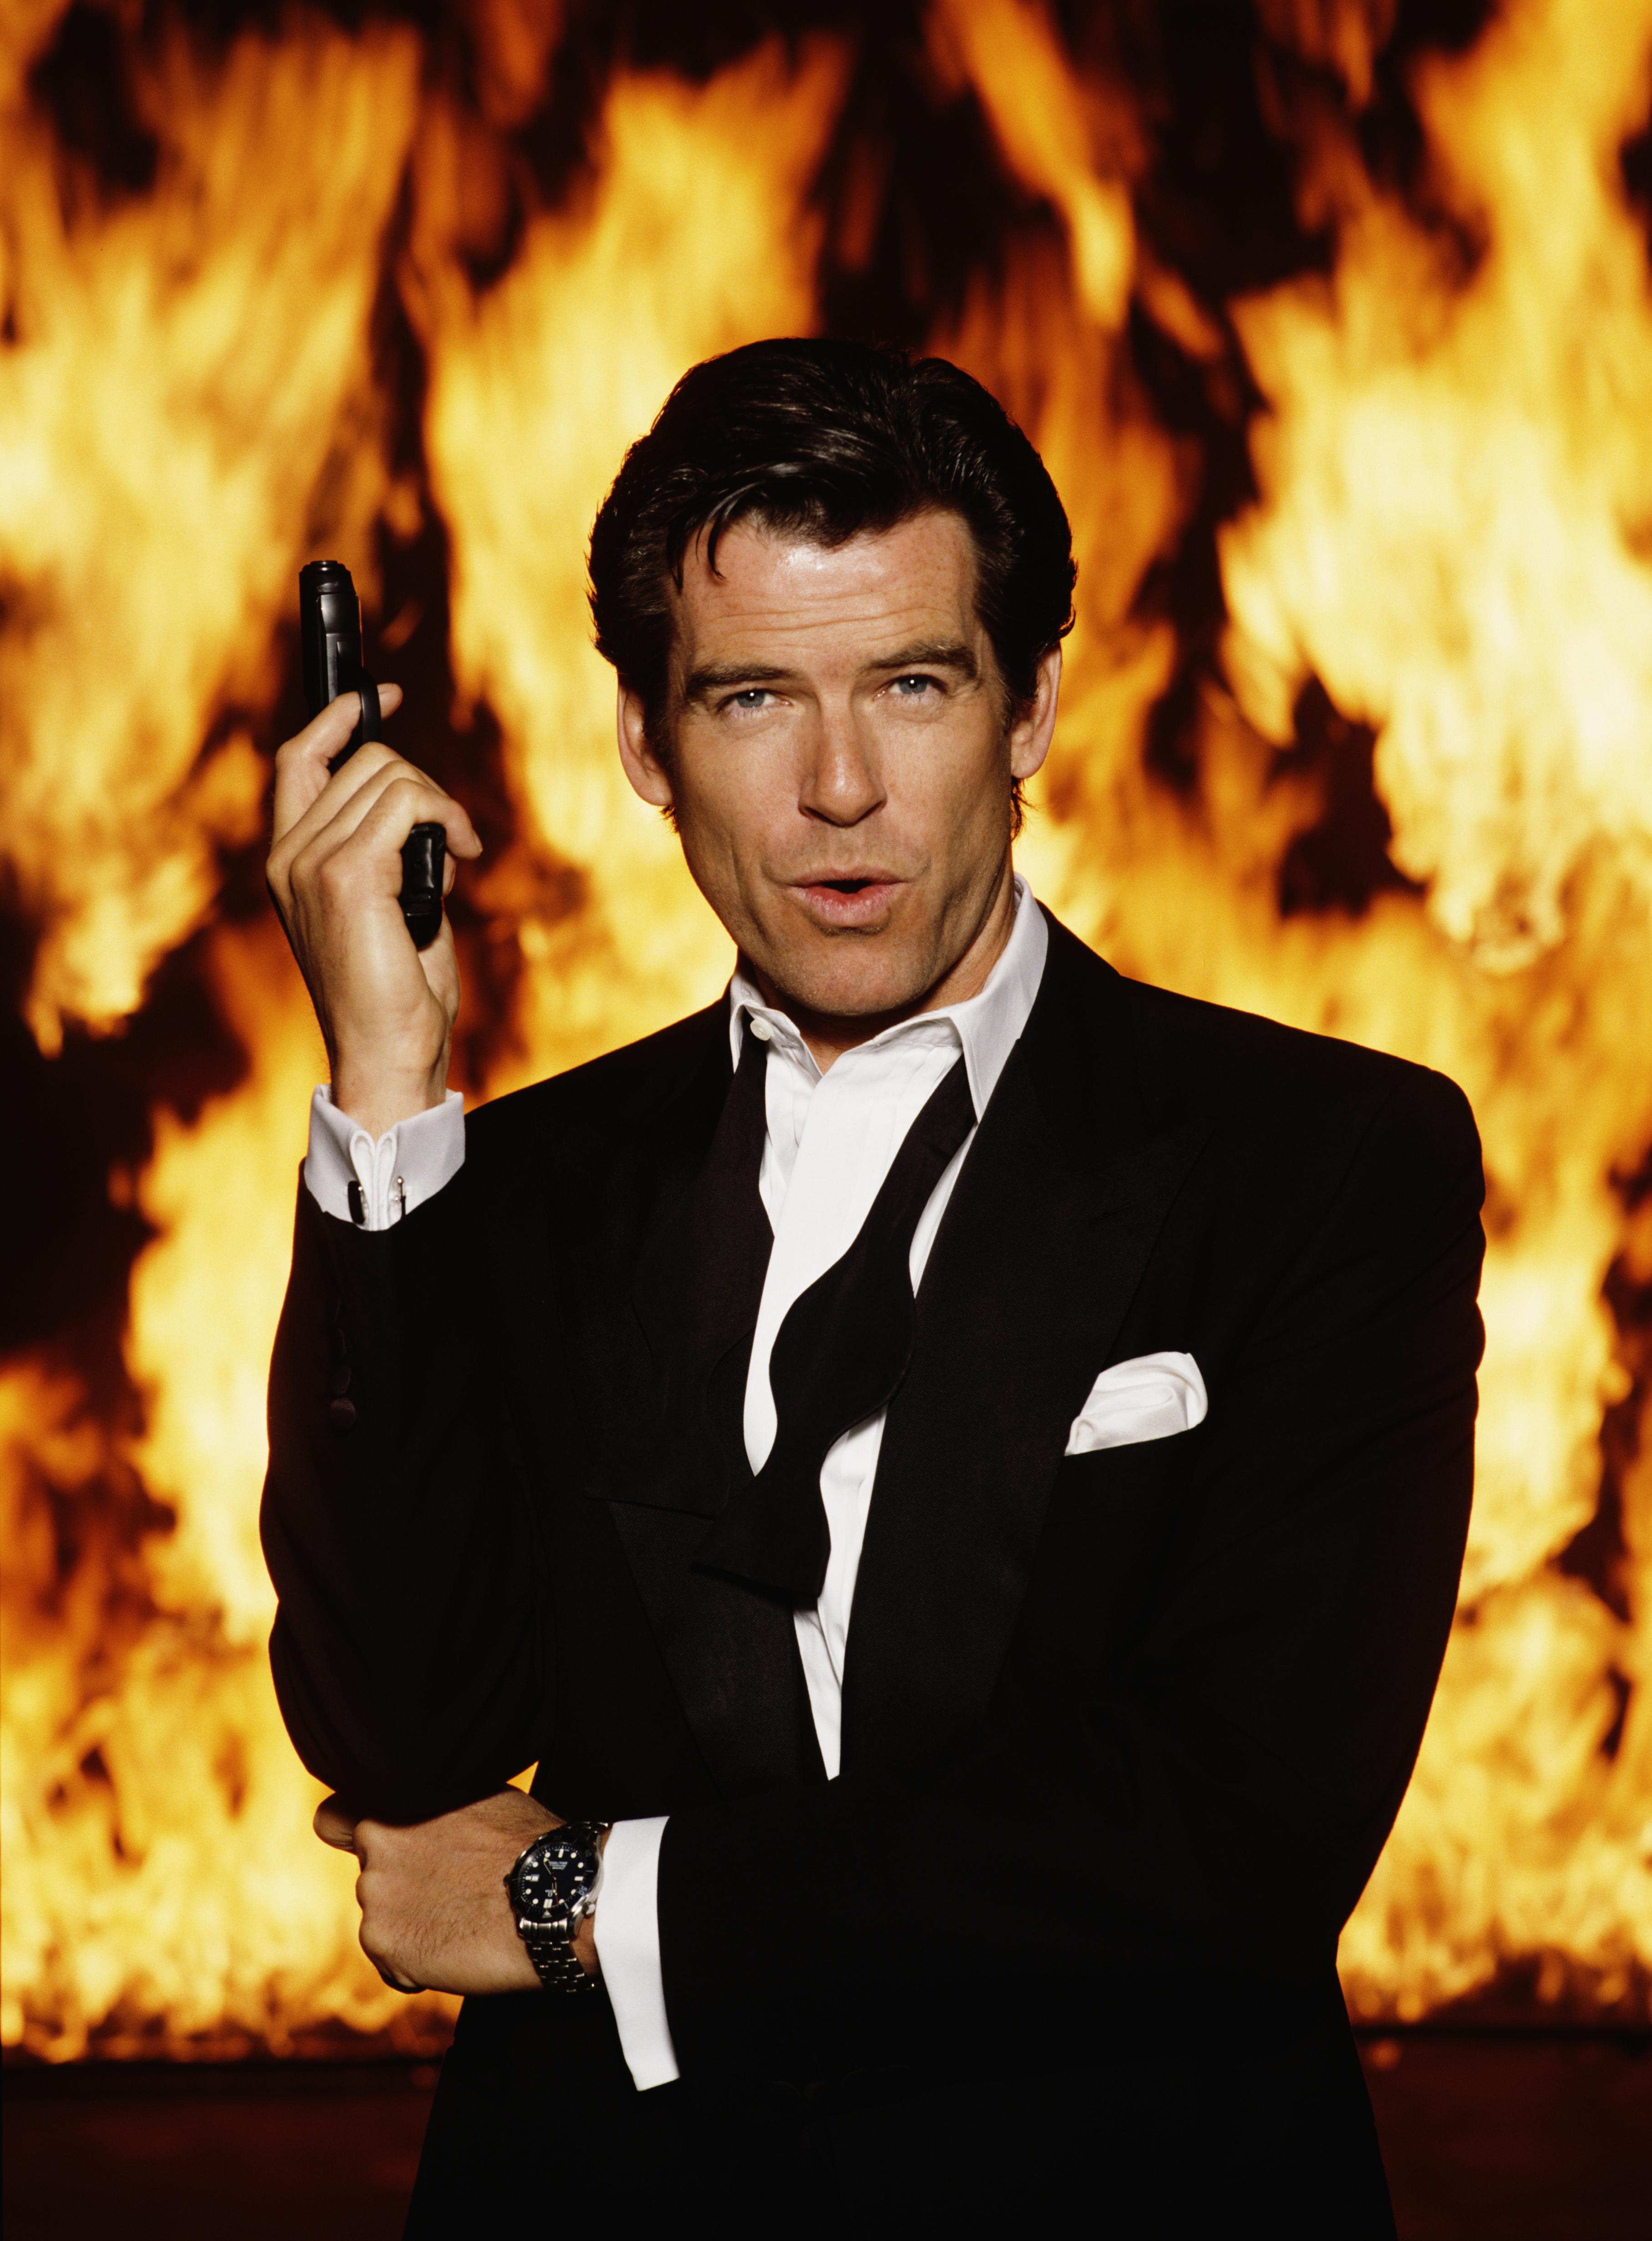 Foto promocional de Pierce Brosnan para o filme 007 Contra GoldenEye ® Keith Hamshere